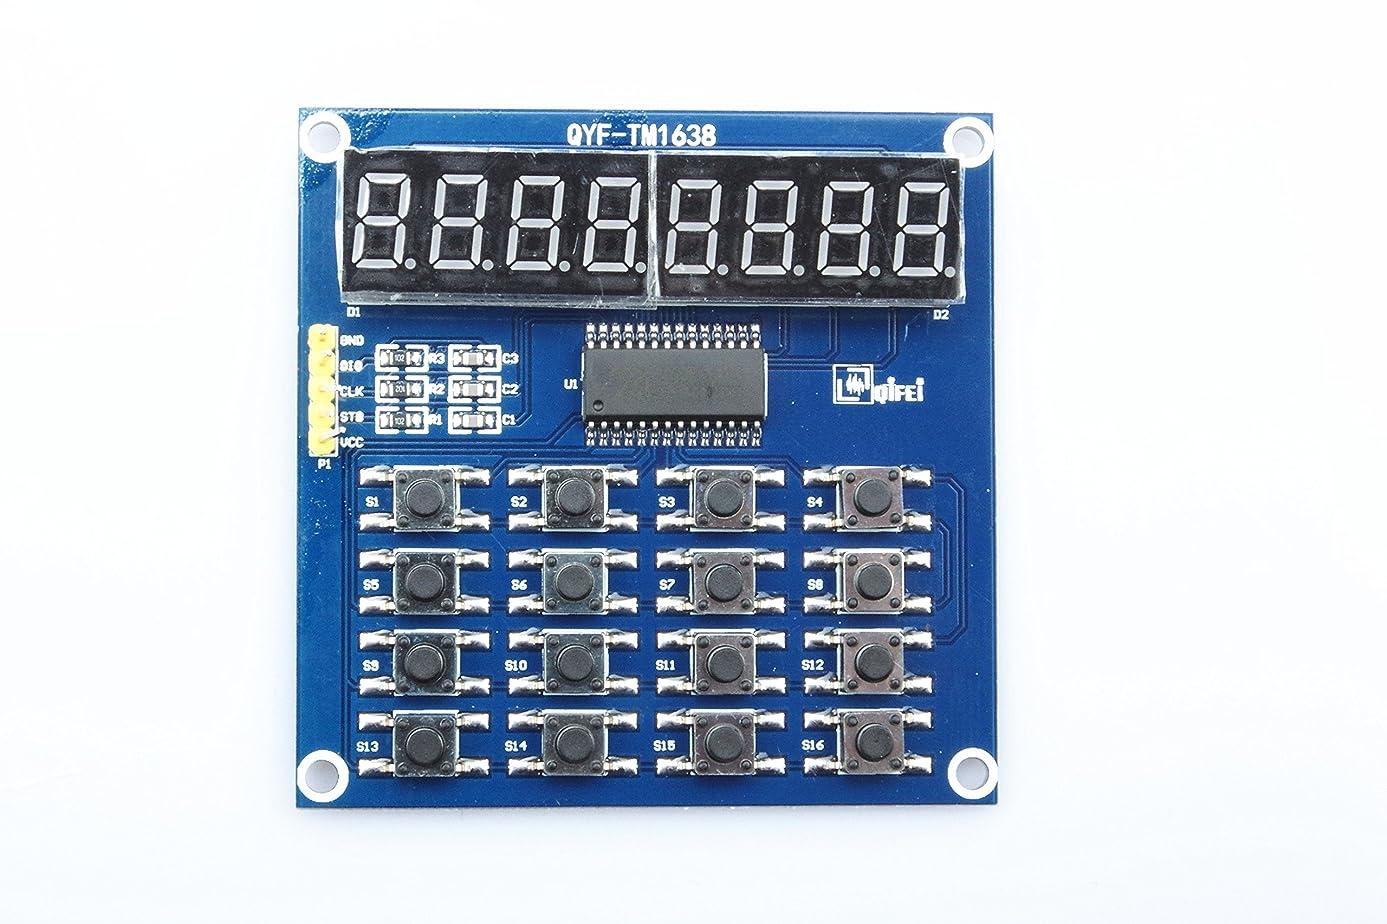 KNACRO TM1638 8 Bits three-wire control LED Digital Tube Display Module Keyboard Scan and Display Module Single chip microcomputer module